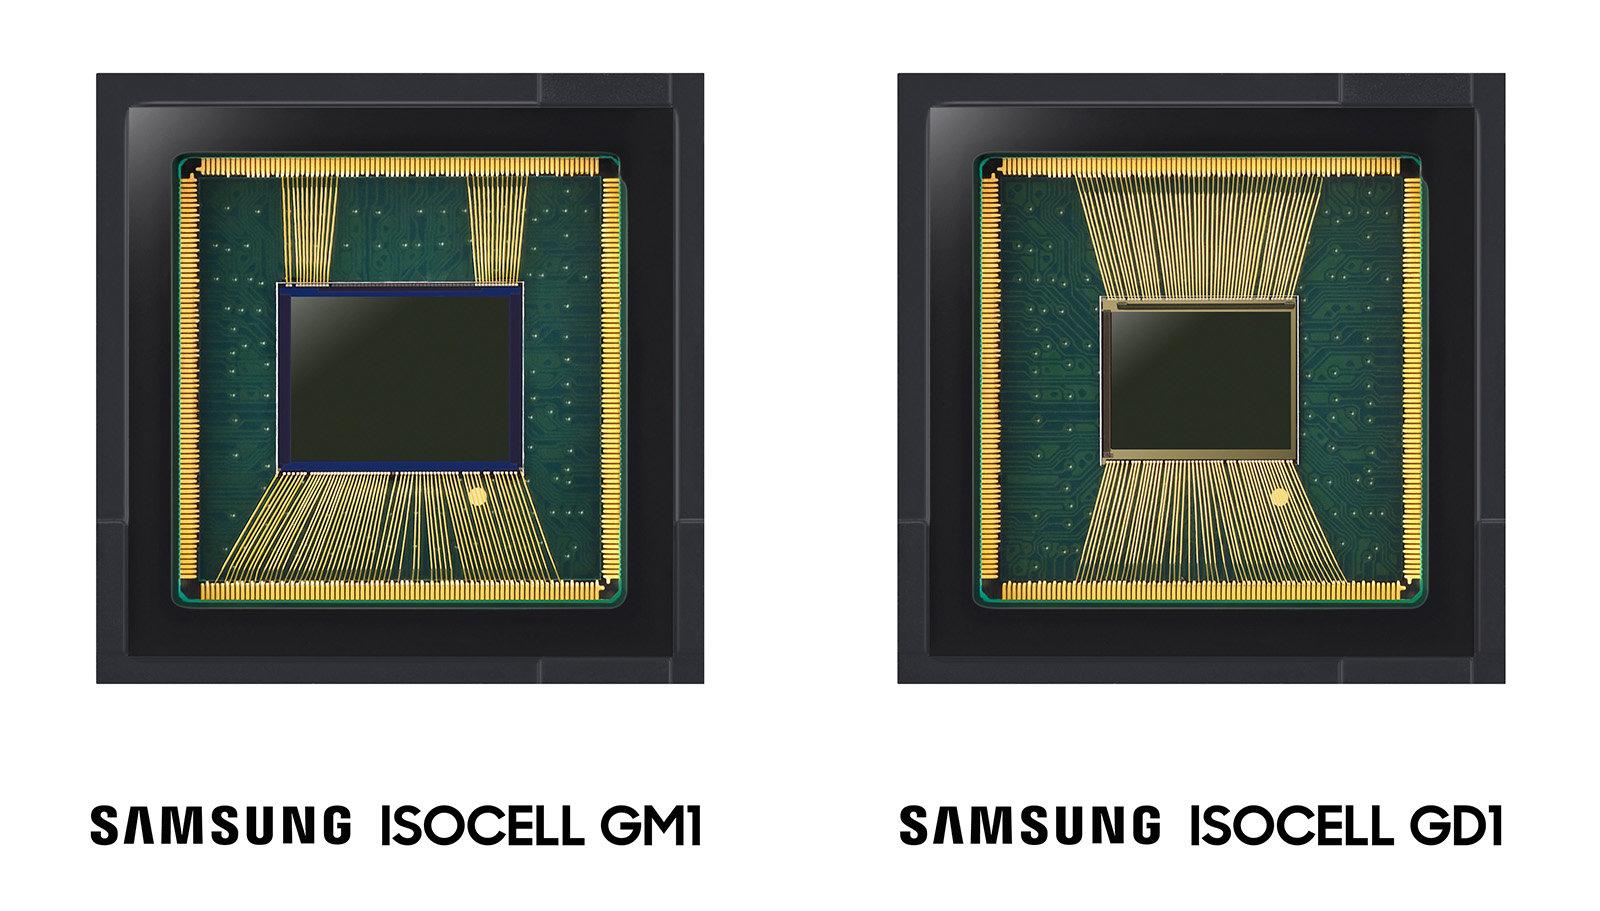 Samsung GALAXY S10 camera isocell 1